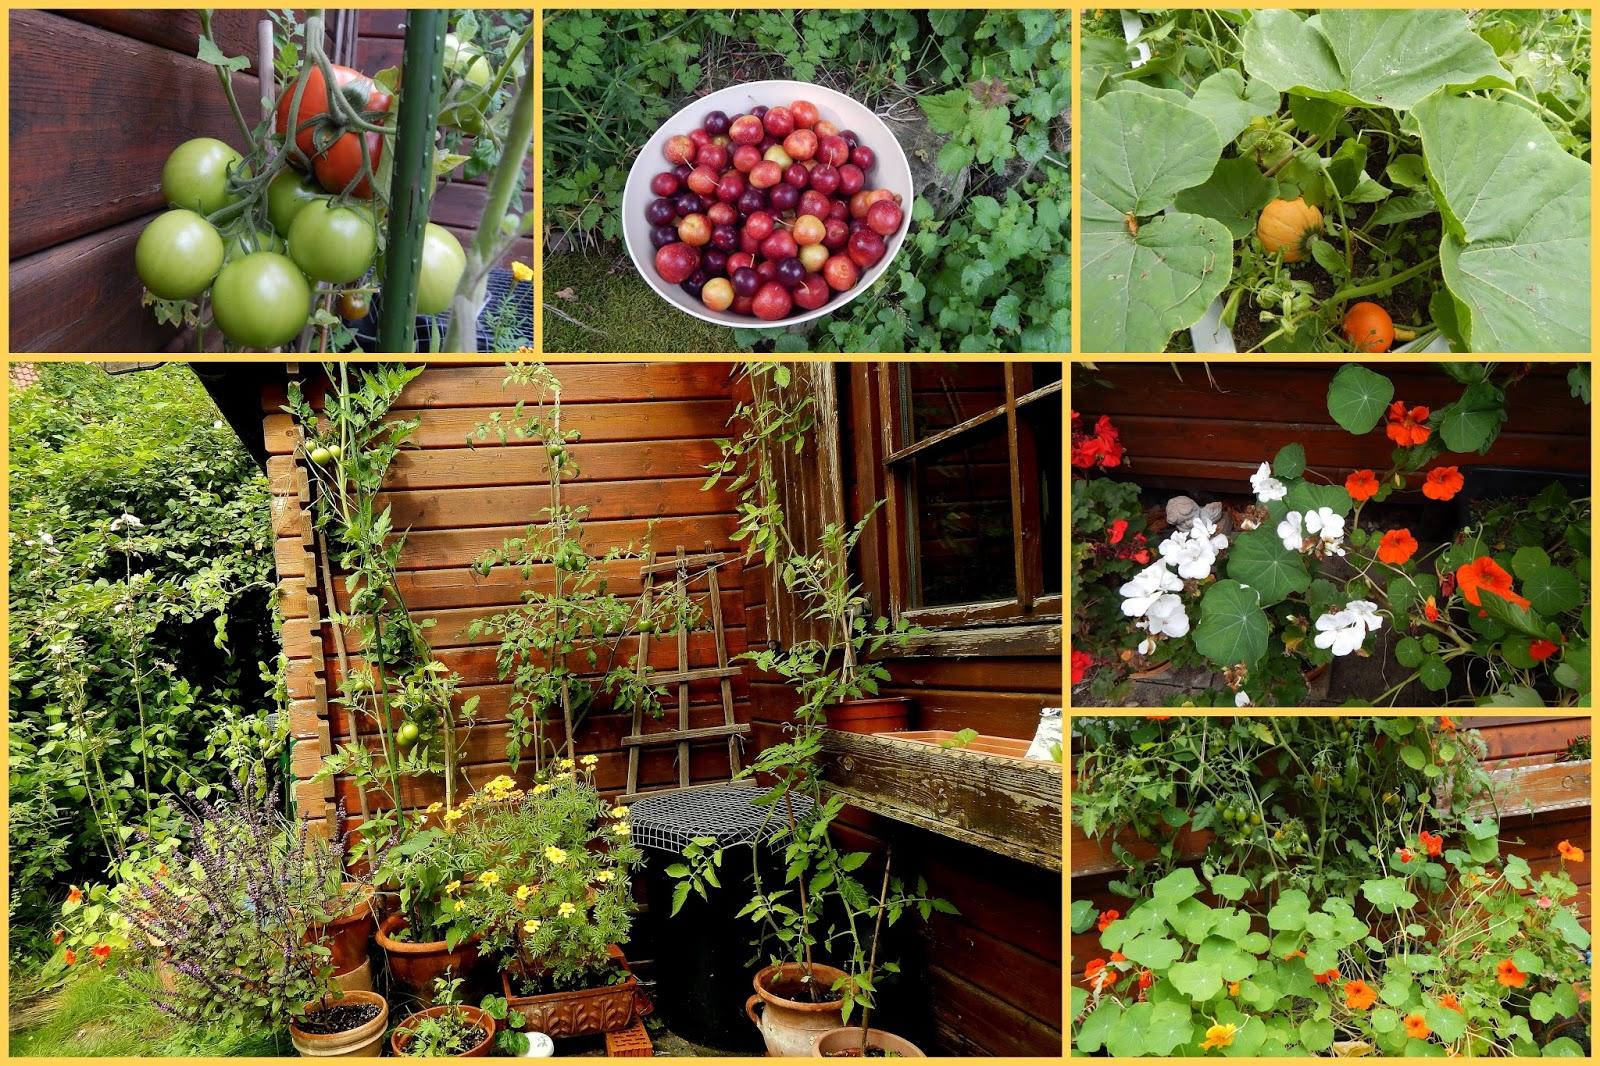 Garten Im September reisbluete veganblog biovegan gärtnern im september baumspinat